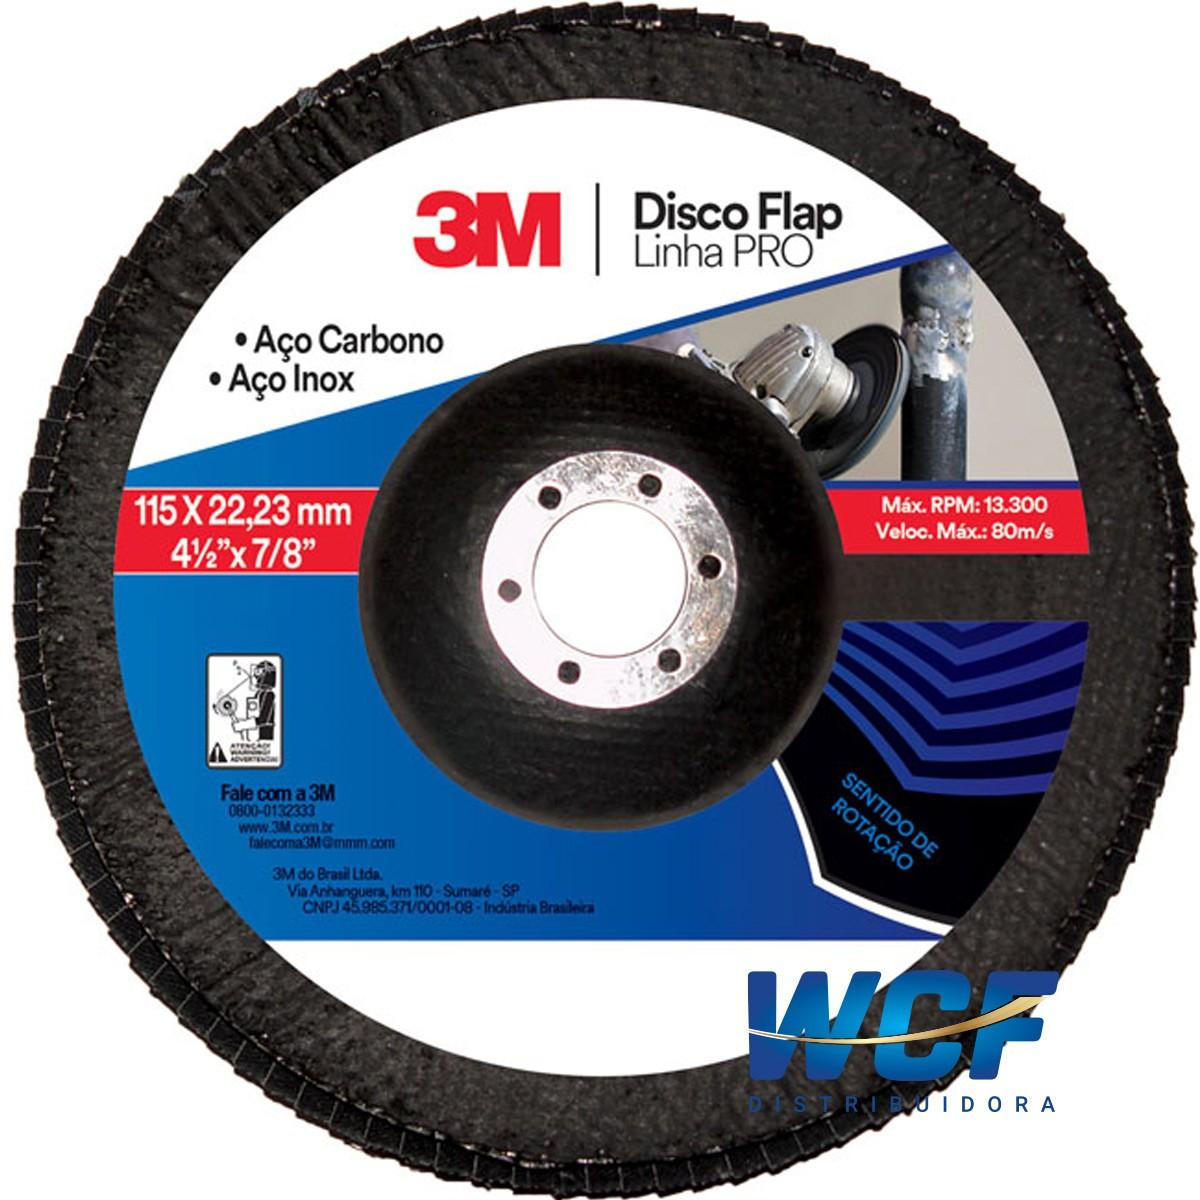 3M DISCO FLAP DISC 40